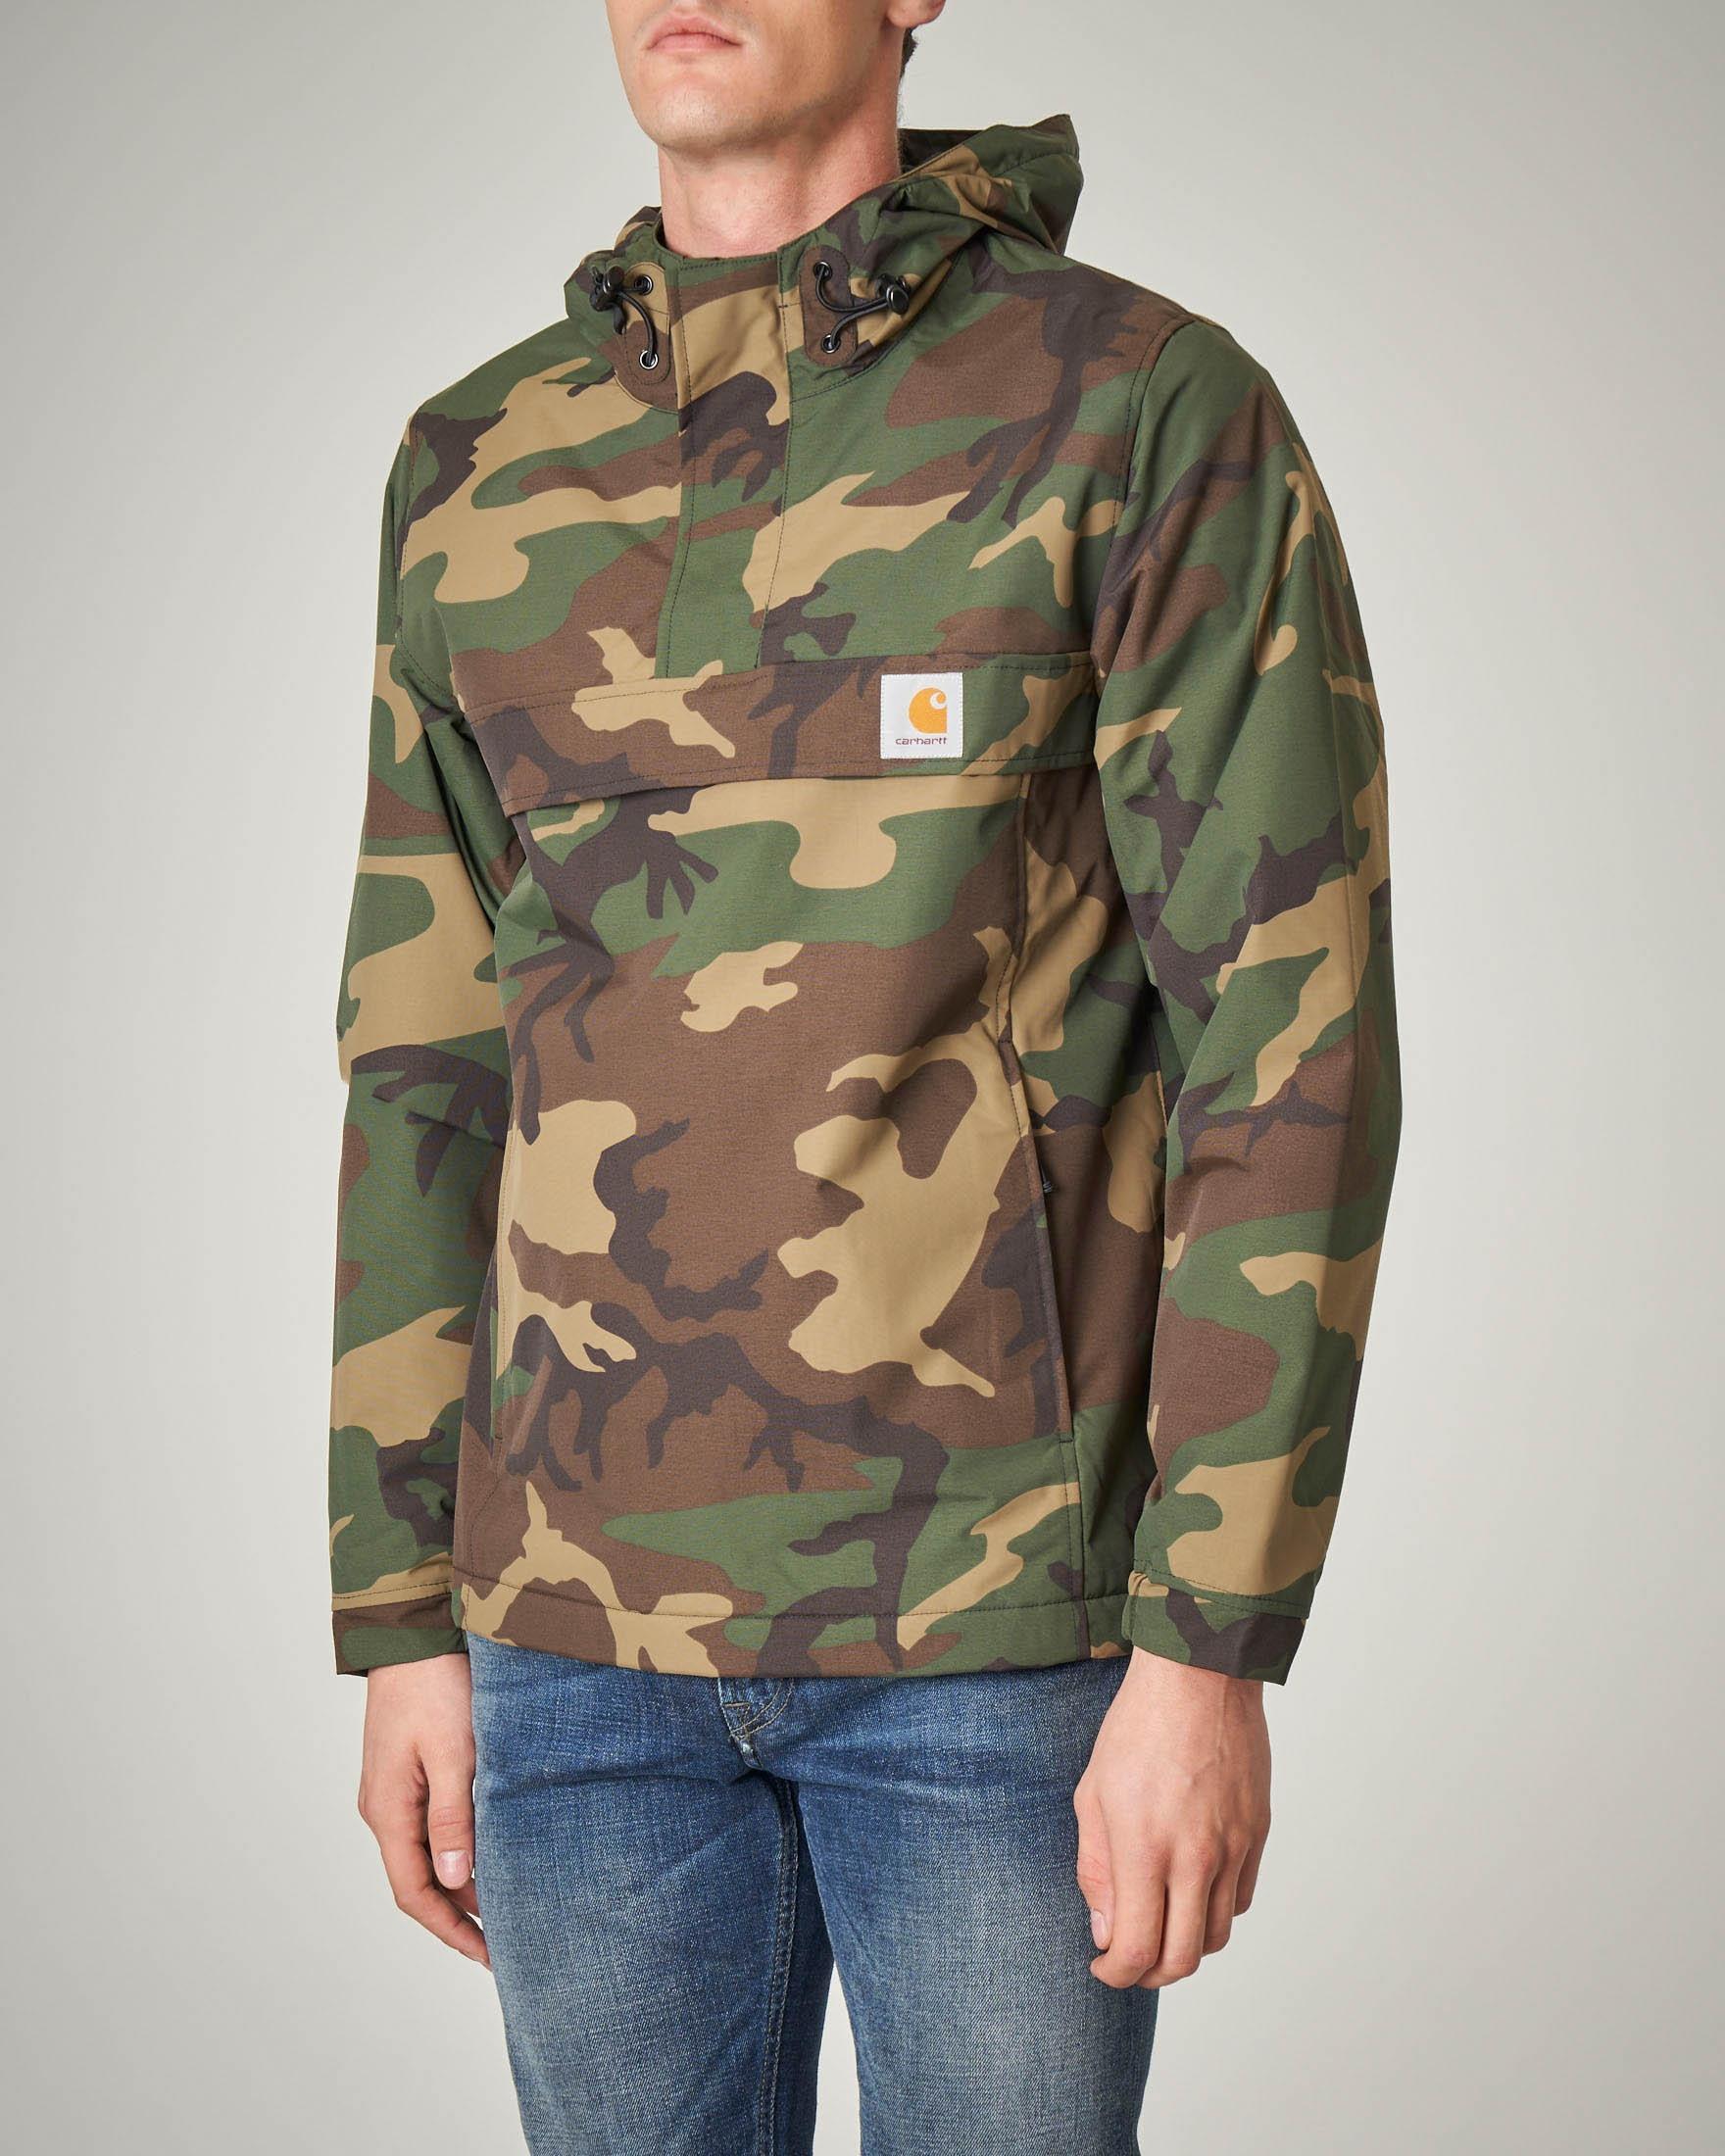 Giacca Nimbus camouflage